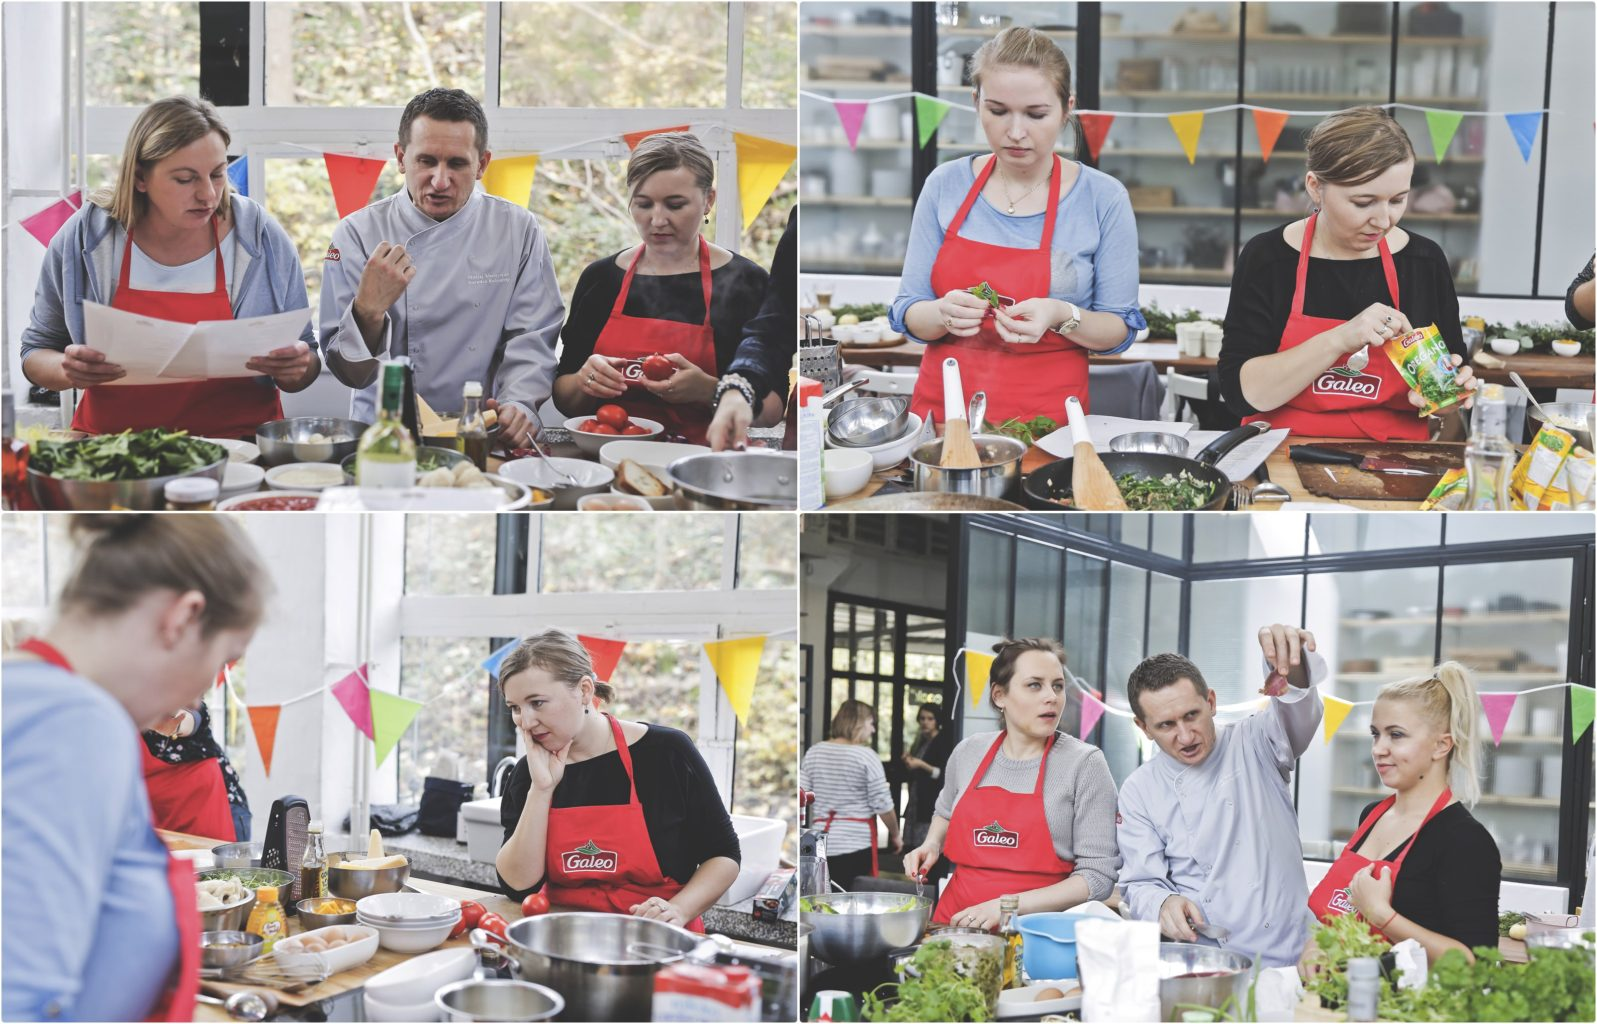 warsztaty kulinarne, street food, Galeo, Cook Up, Warszawa